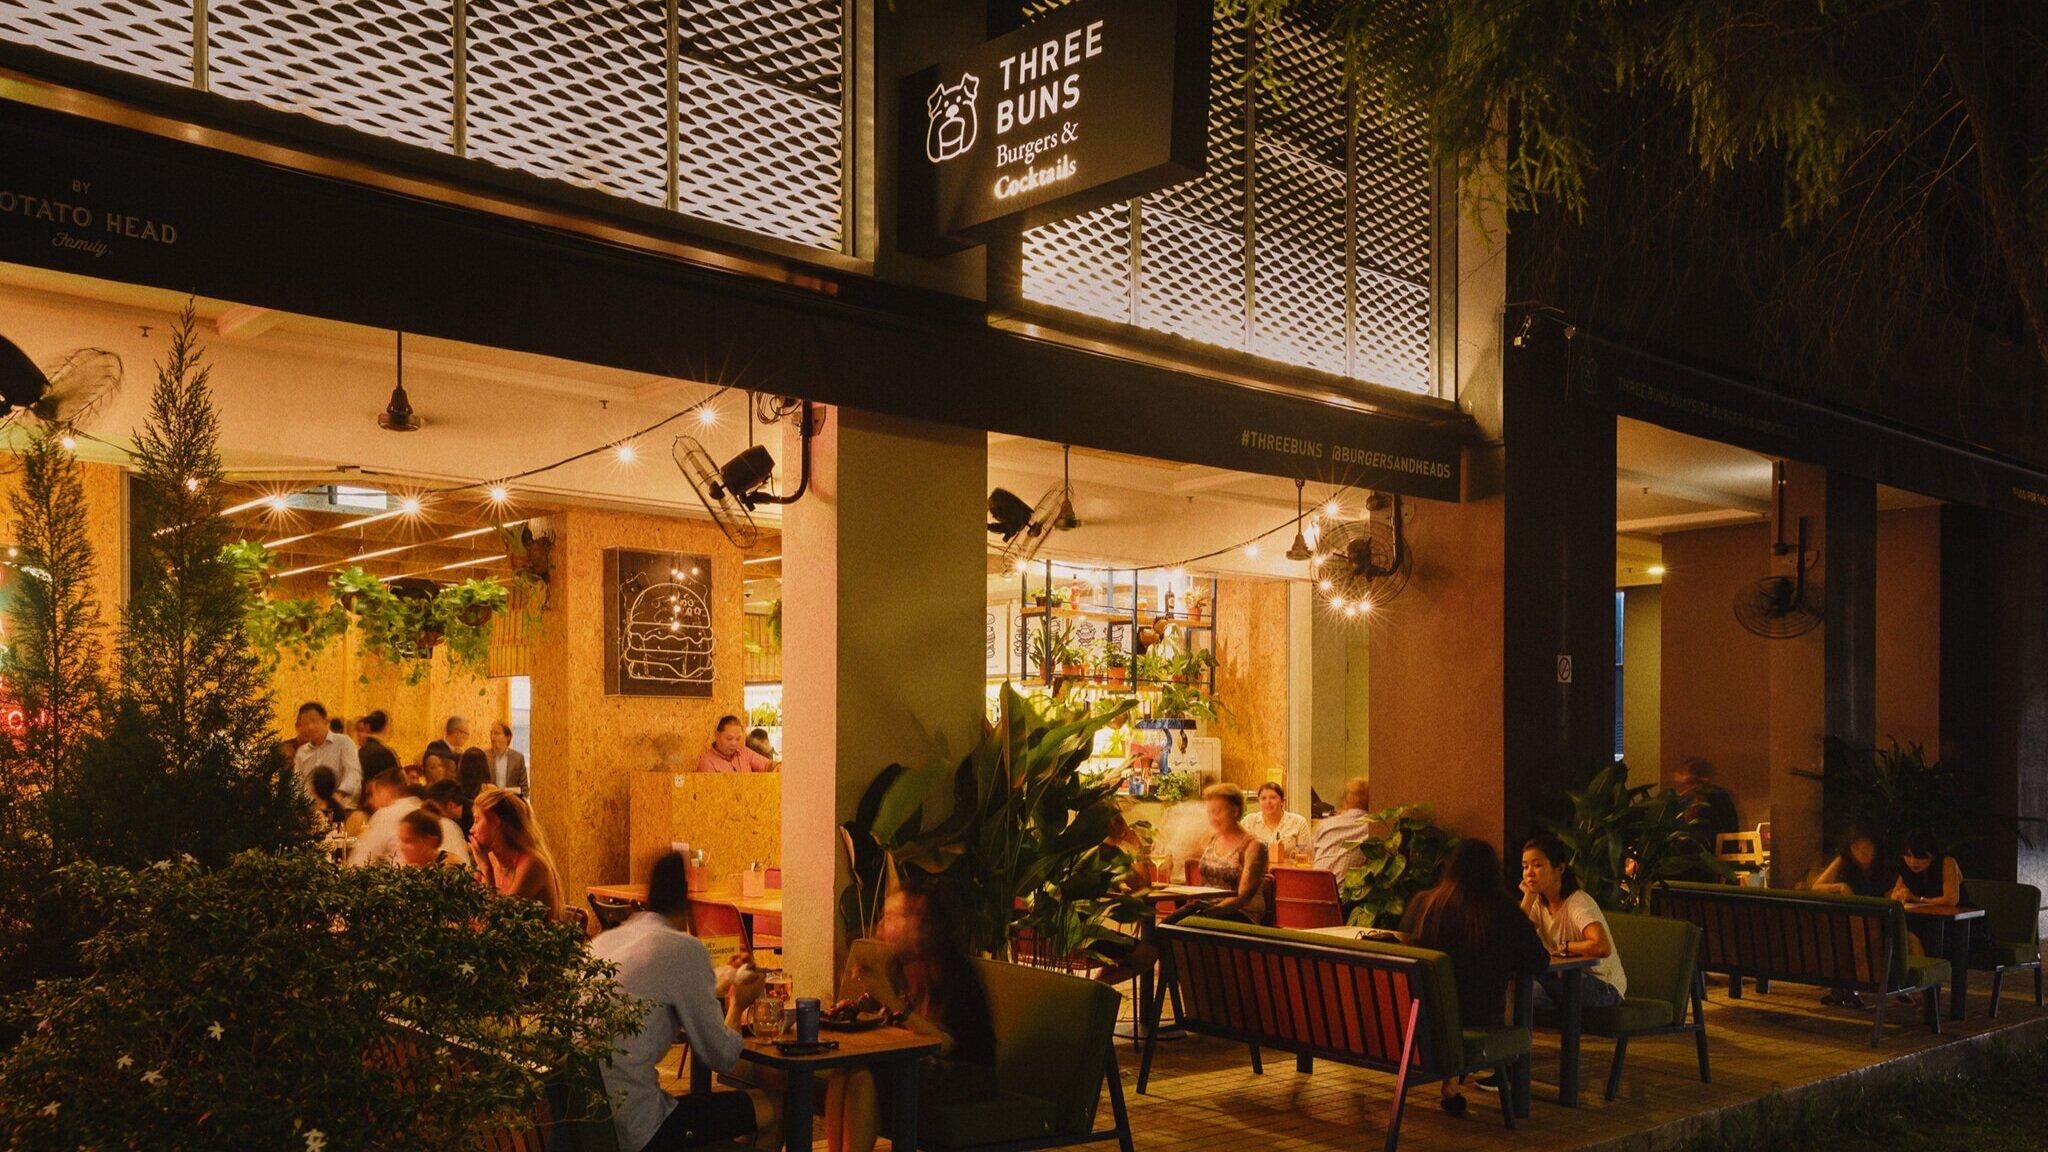 Three Buns Singapore | Burger and cocktail bar — Three Buns Burgers & Cocktails | Best burgers in Jakarta & Singapore